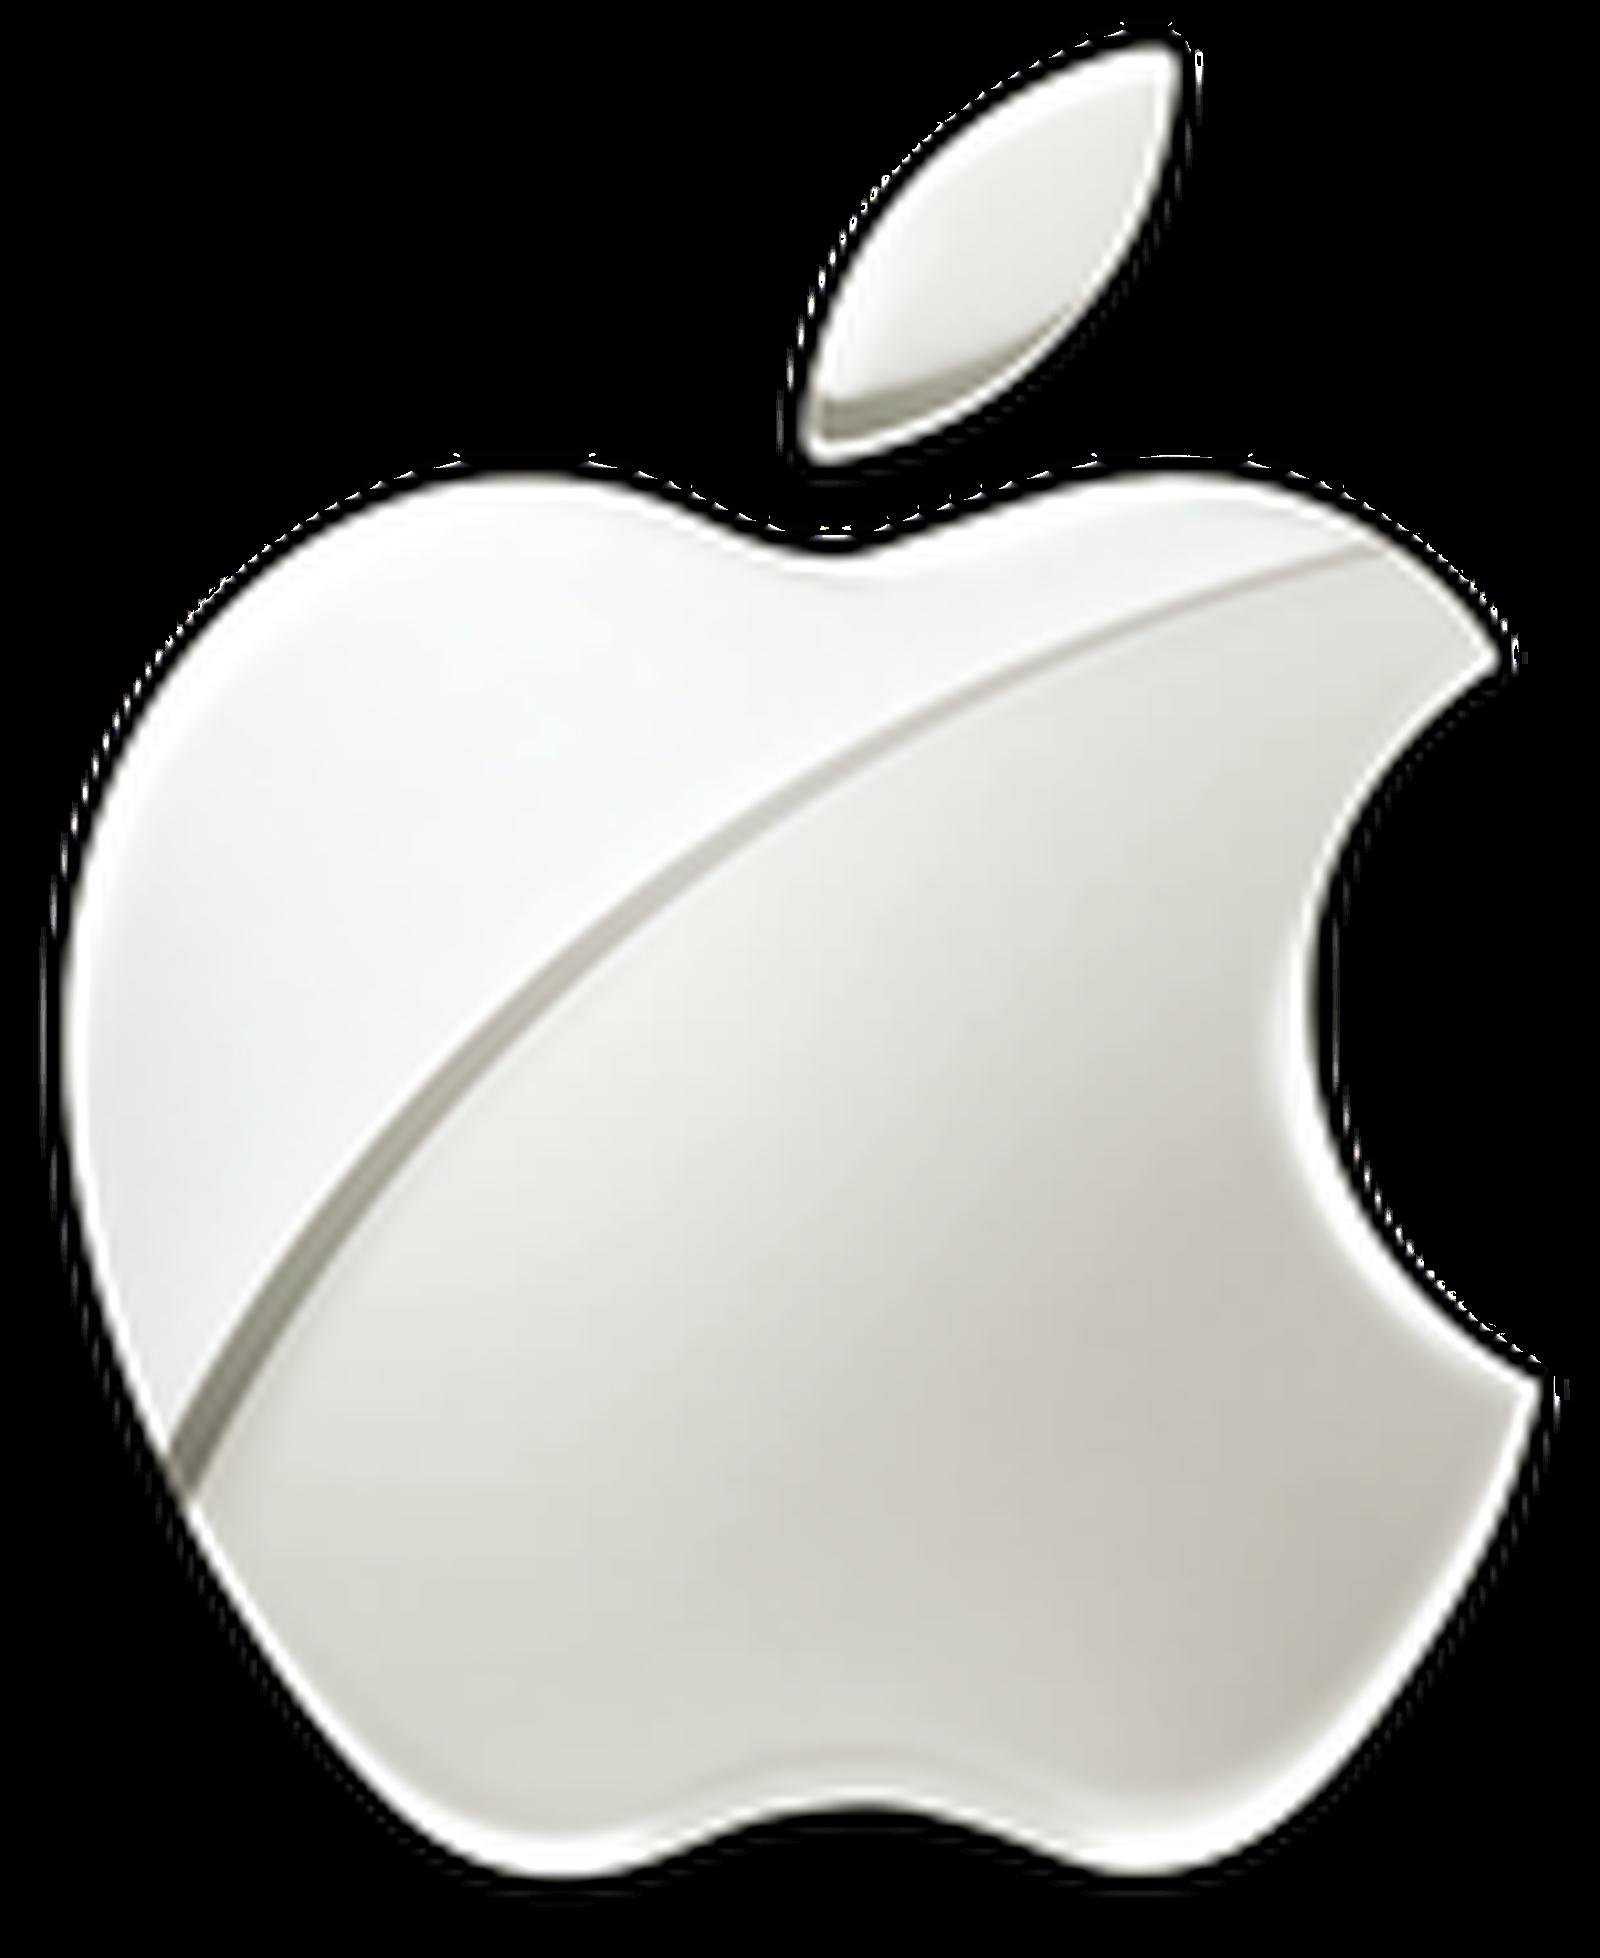 Macrumors Apple Mac Iphone Rumors And News Page 1675